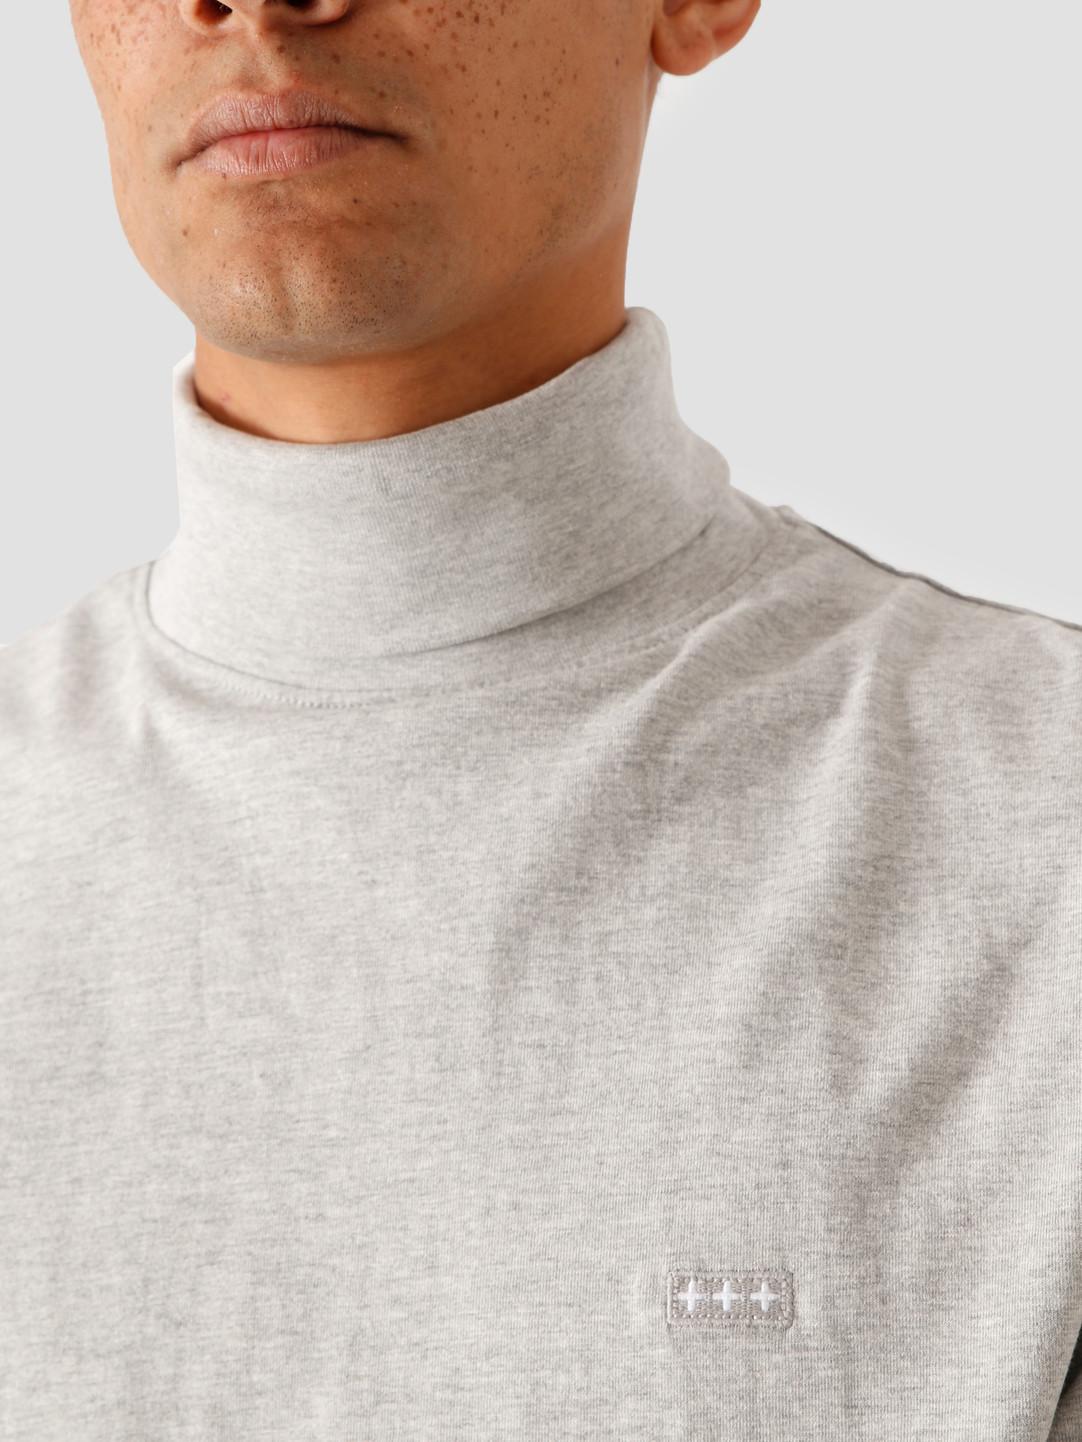 Quality Blanks Quality Blanks QB08 Rollneck Longsleeve Grey Heather